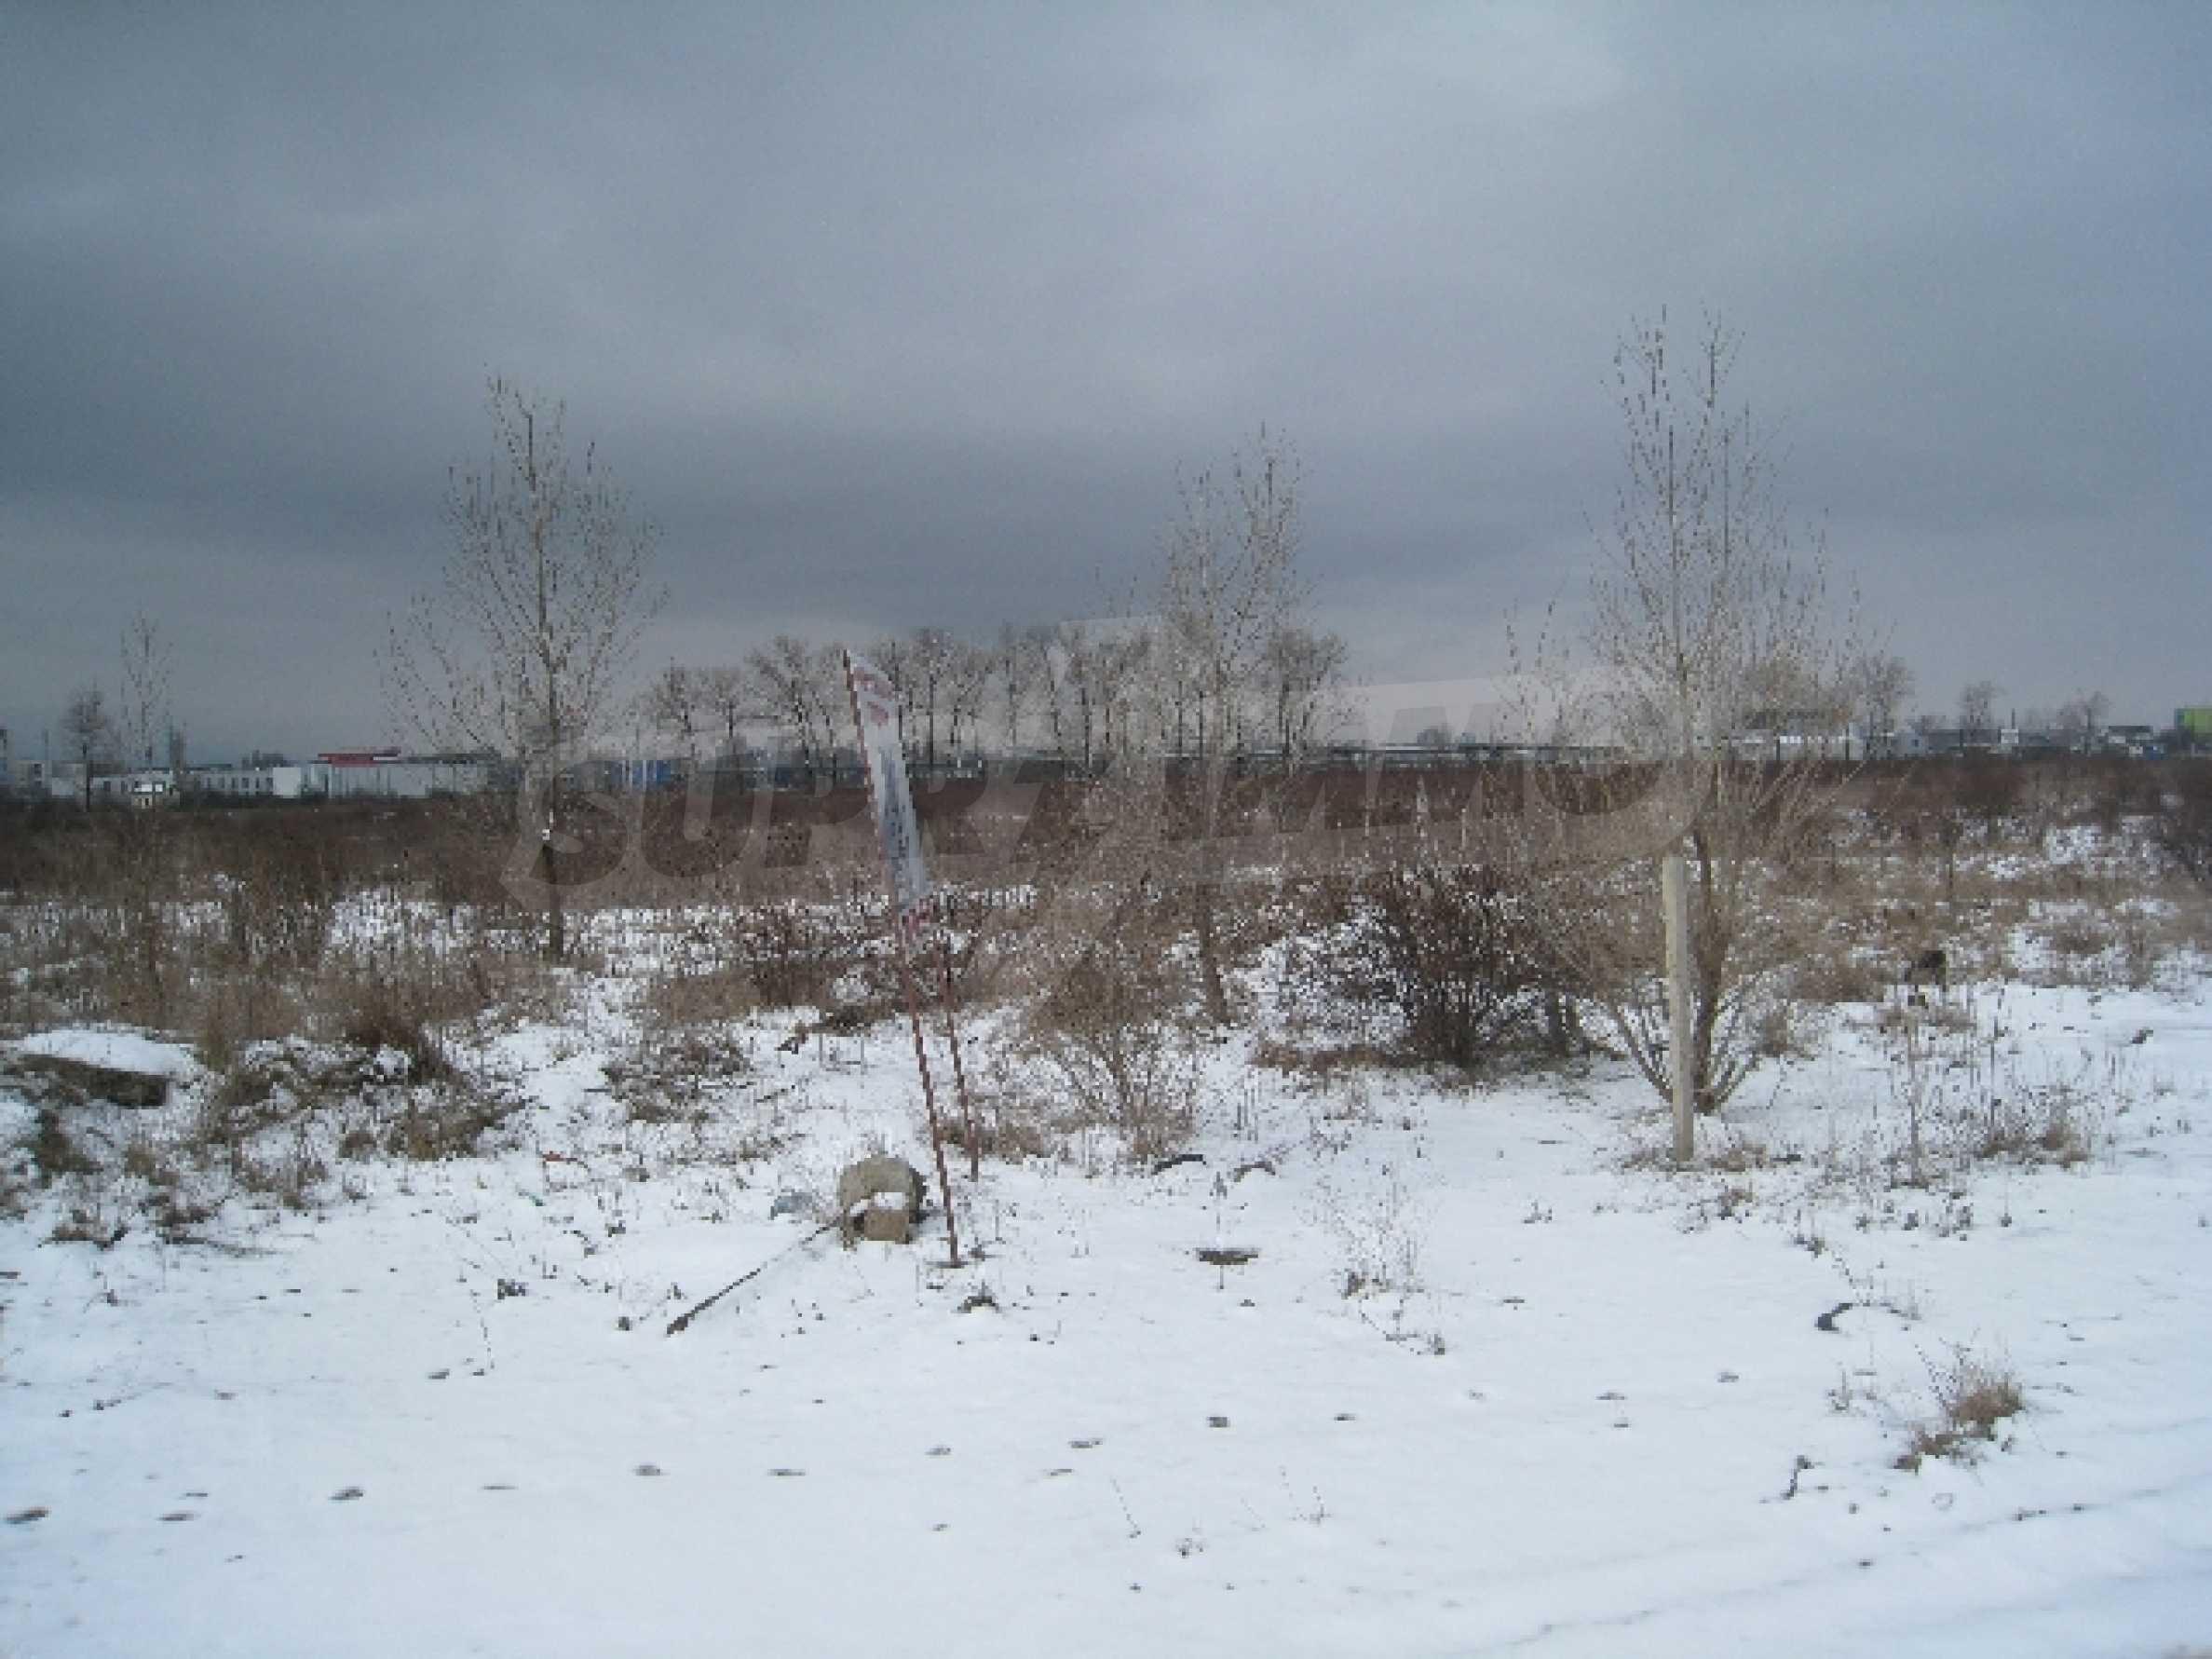 Development land near the Airport 5